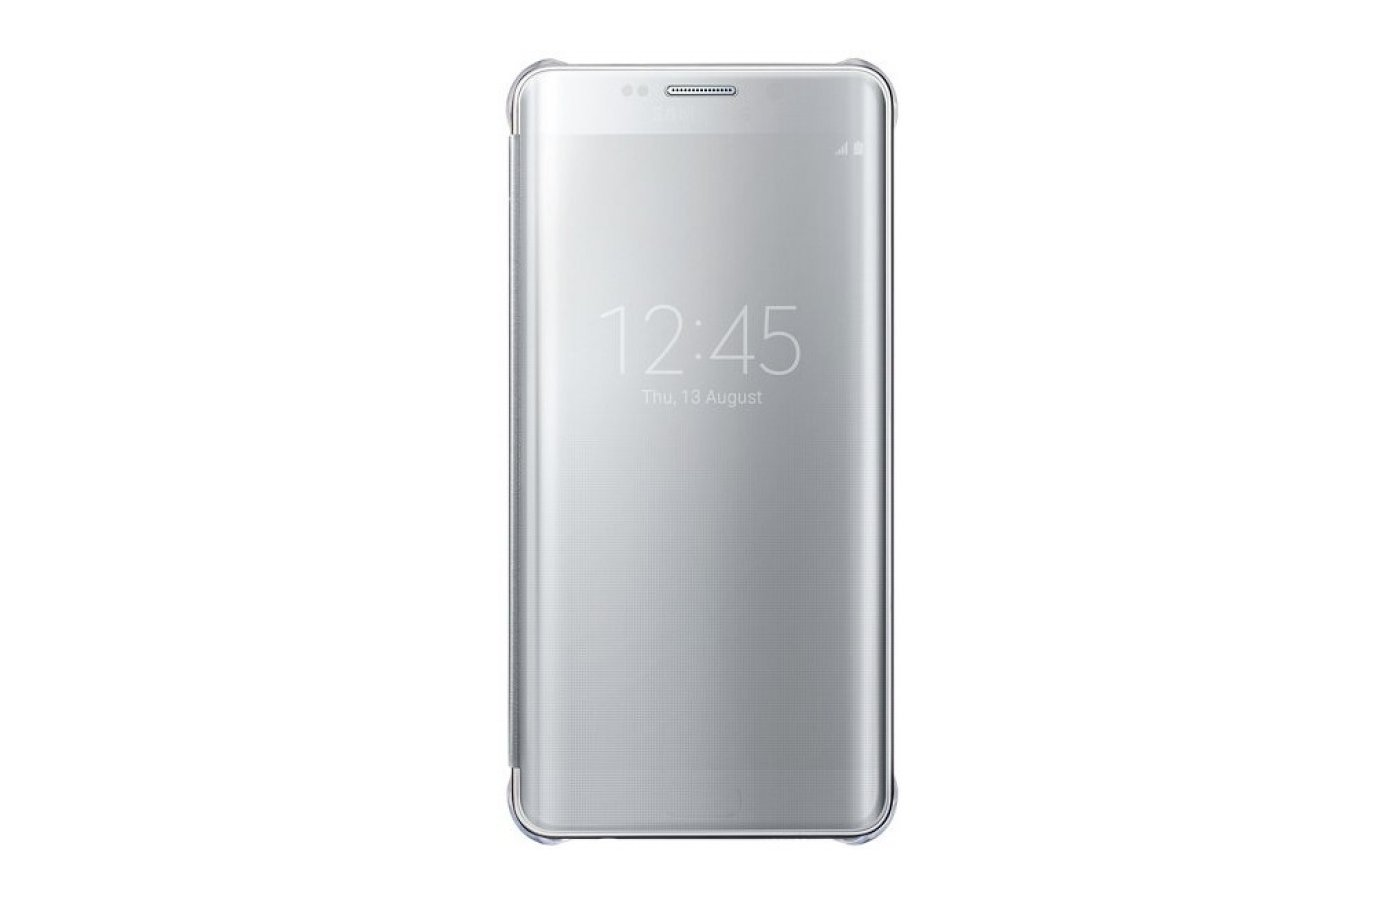 Чехол Samsung ClVCover для Galaxy S6 Edge+ (SM-G928) (EF-ZG928CSEGRU) серый